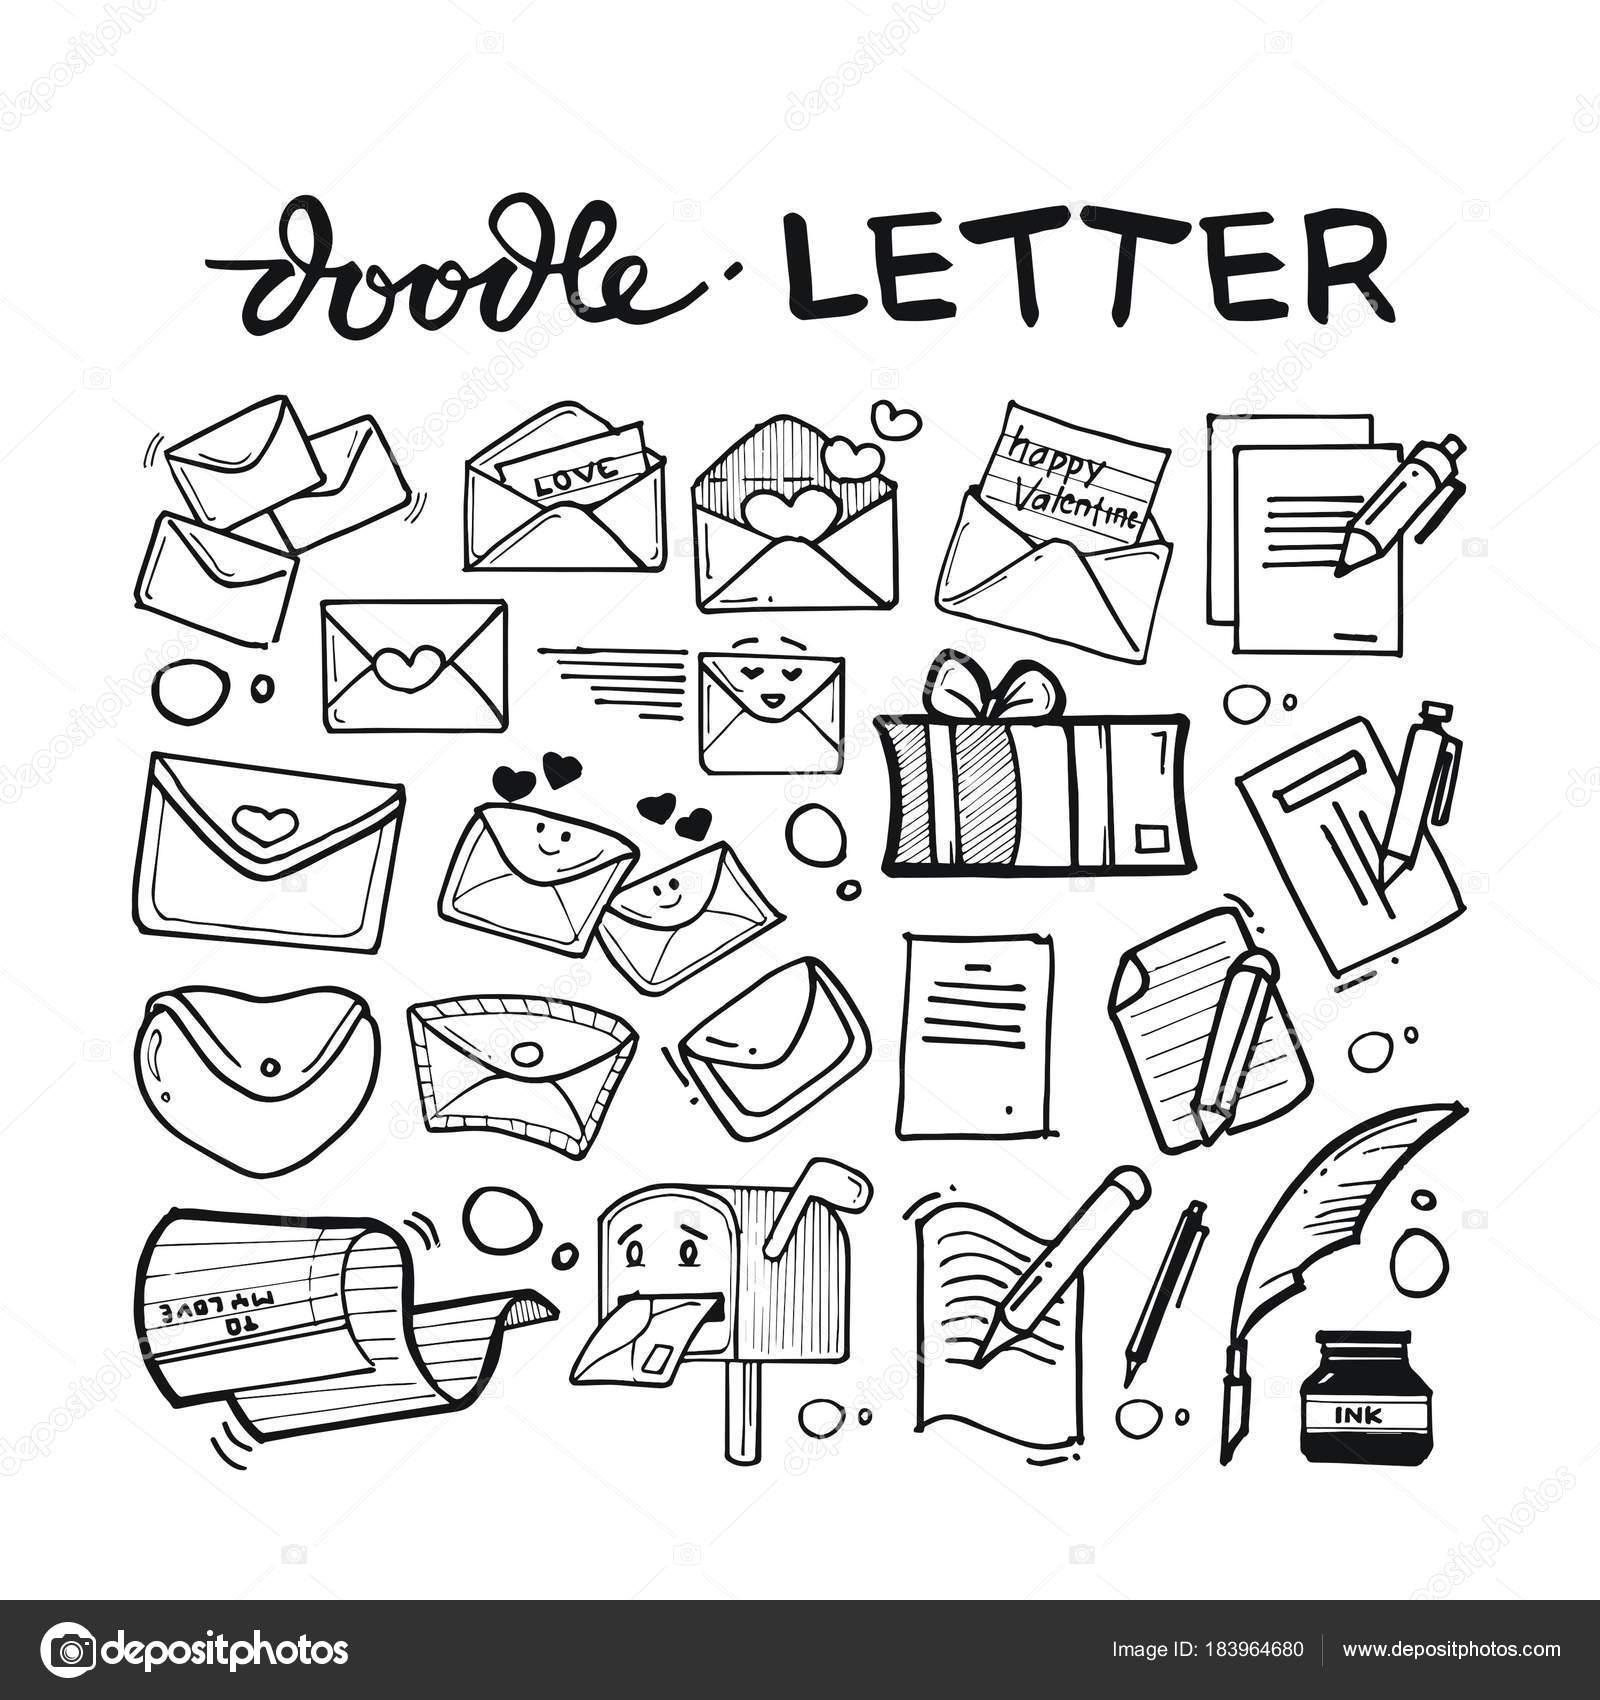 Doodle Letter Design Concept — Stock Vector © Icikuhibiniu